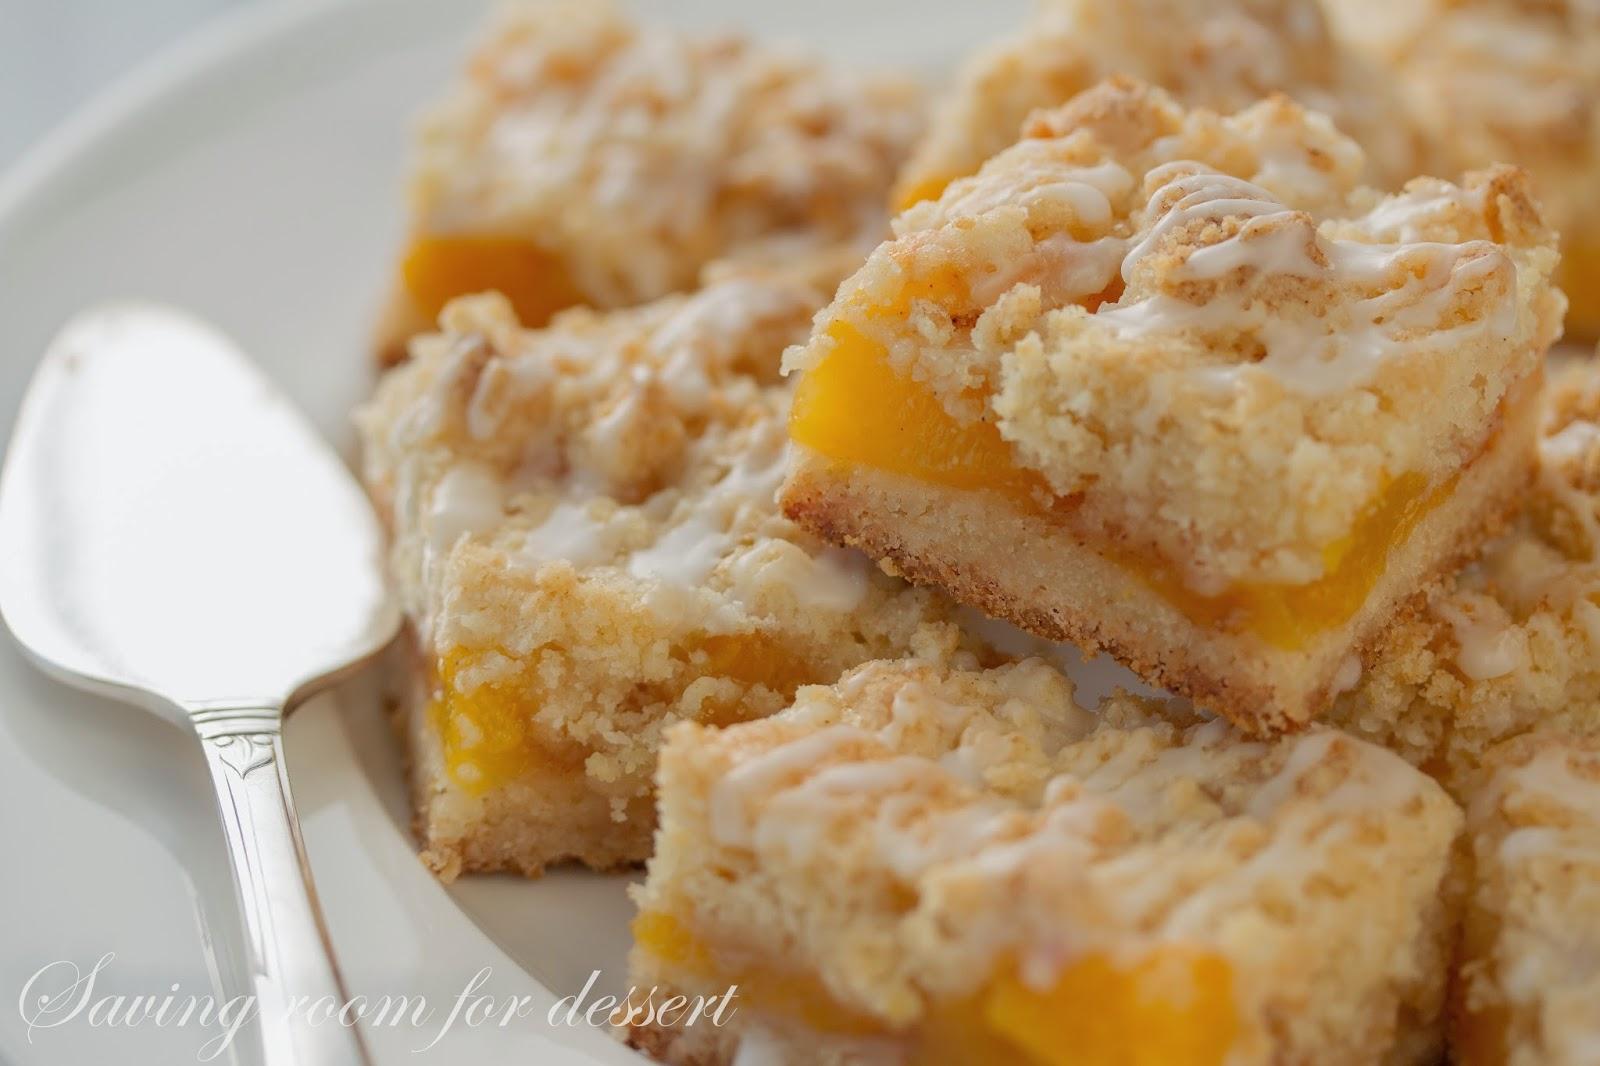 Fresh Peach Crumb Bars - Saving Room for Dessert